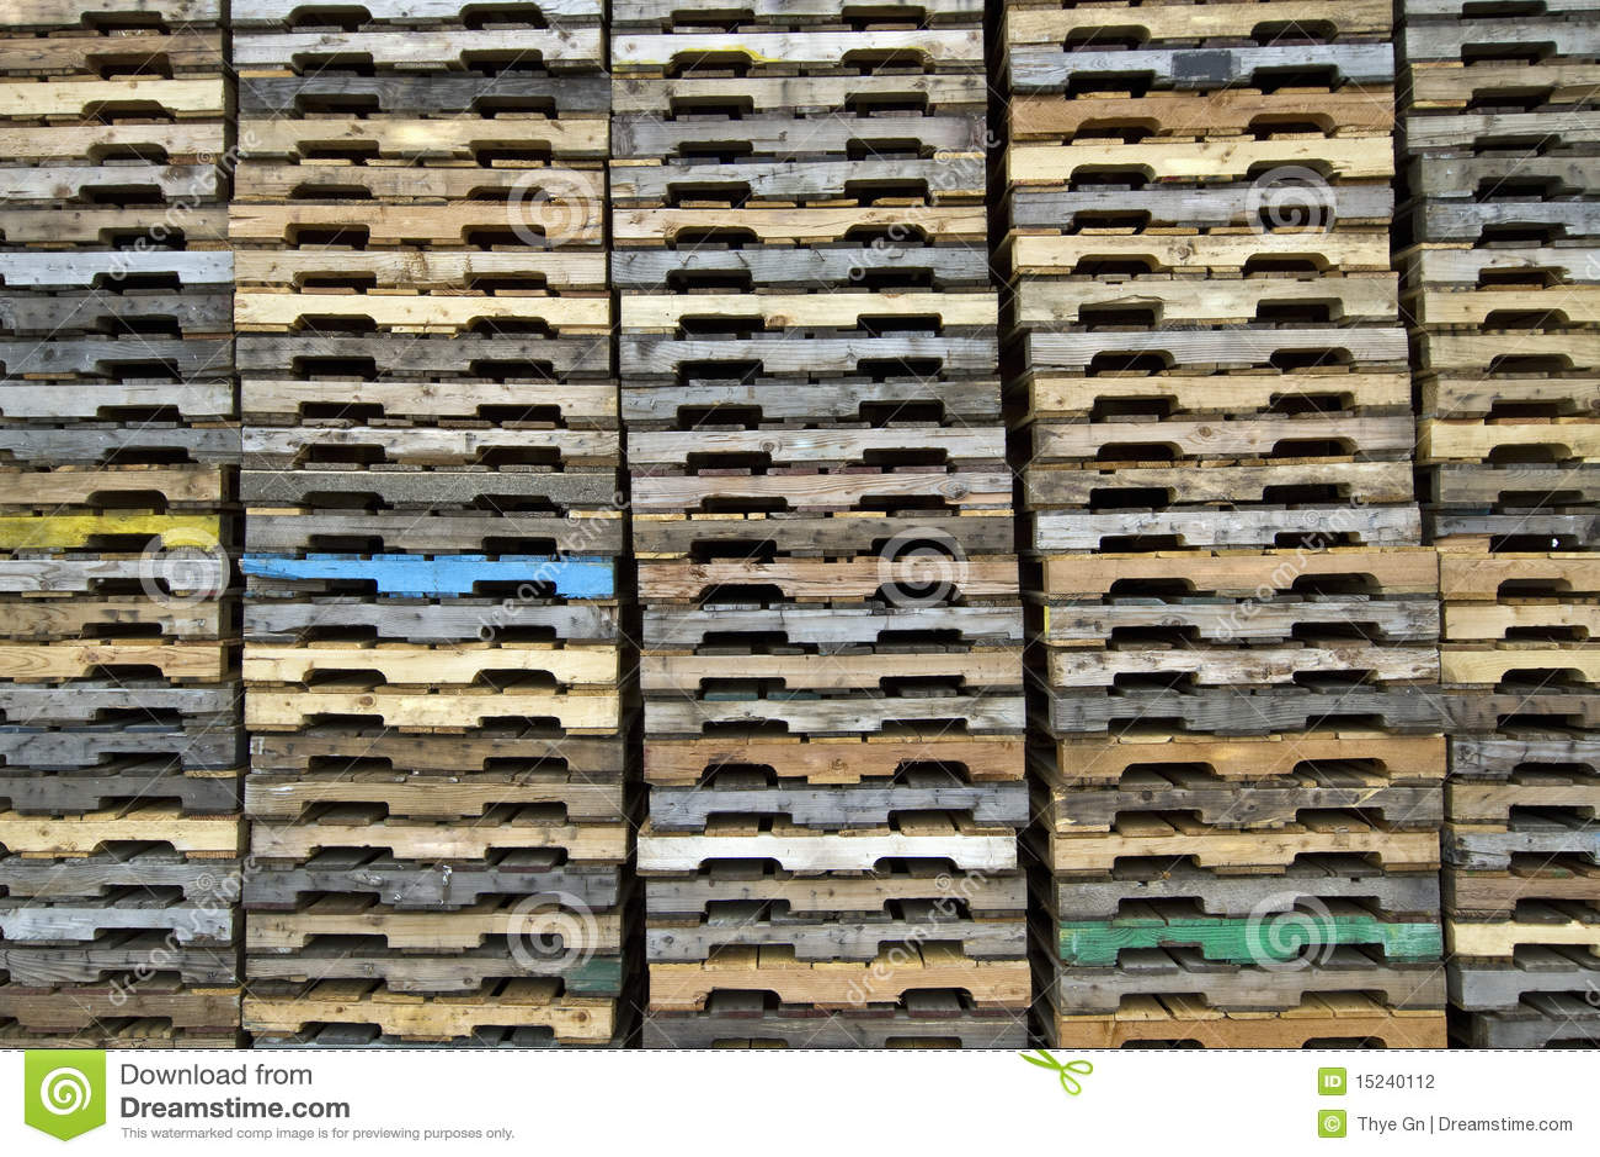 Wood Pallets Background Stock Photography Image 15240112